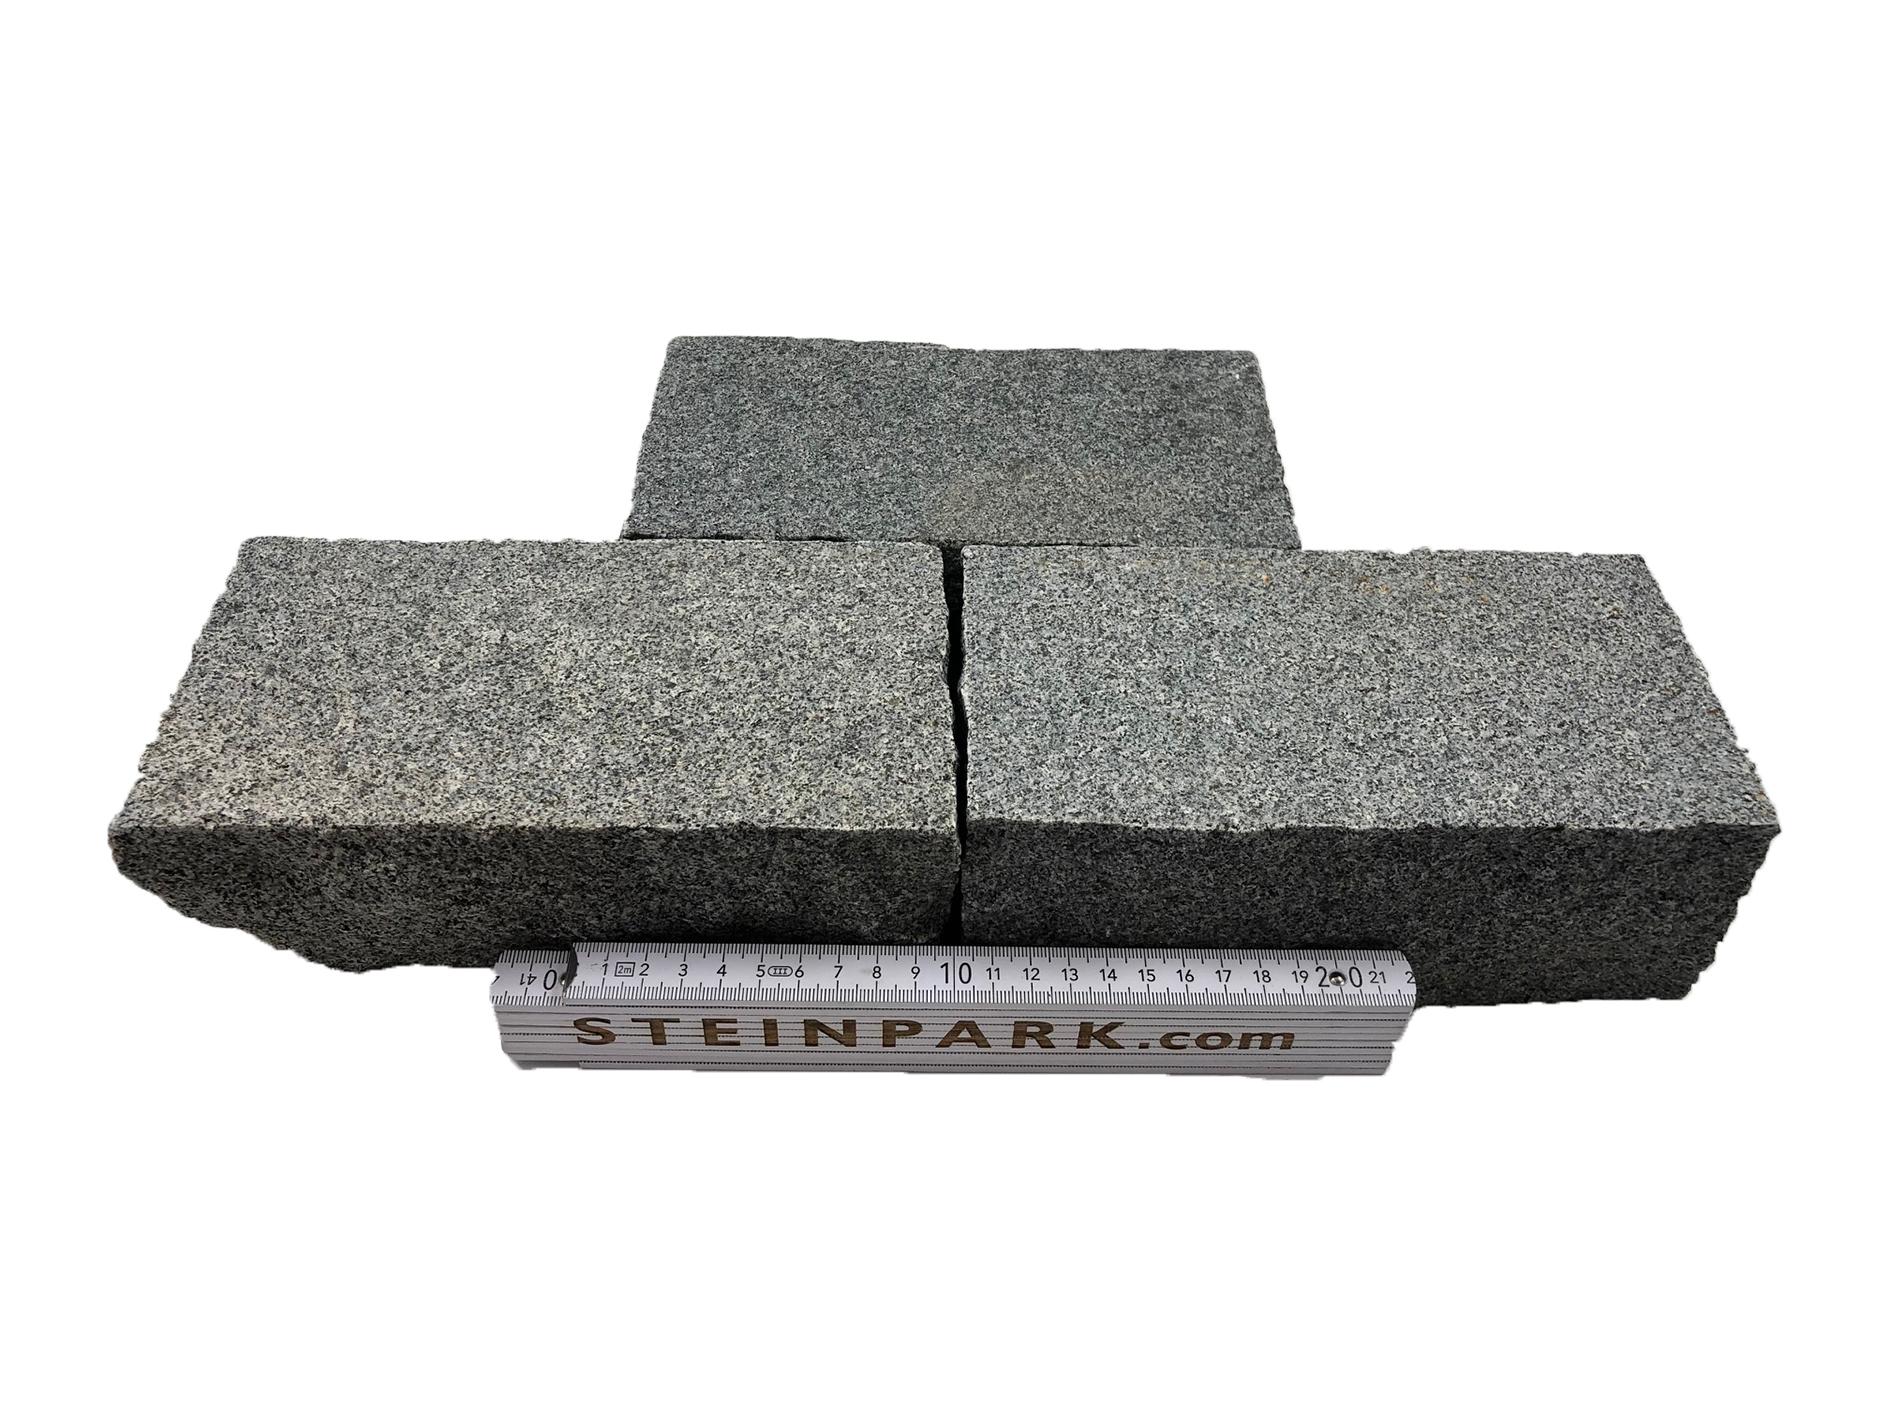 Granit Edelkleinpflaster 20x10x8 cm dunkelgrau